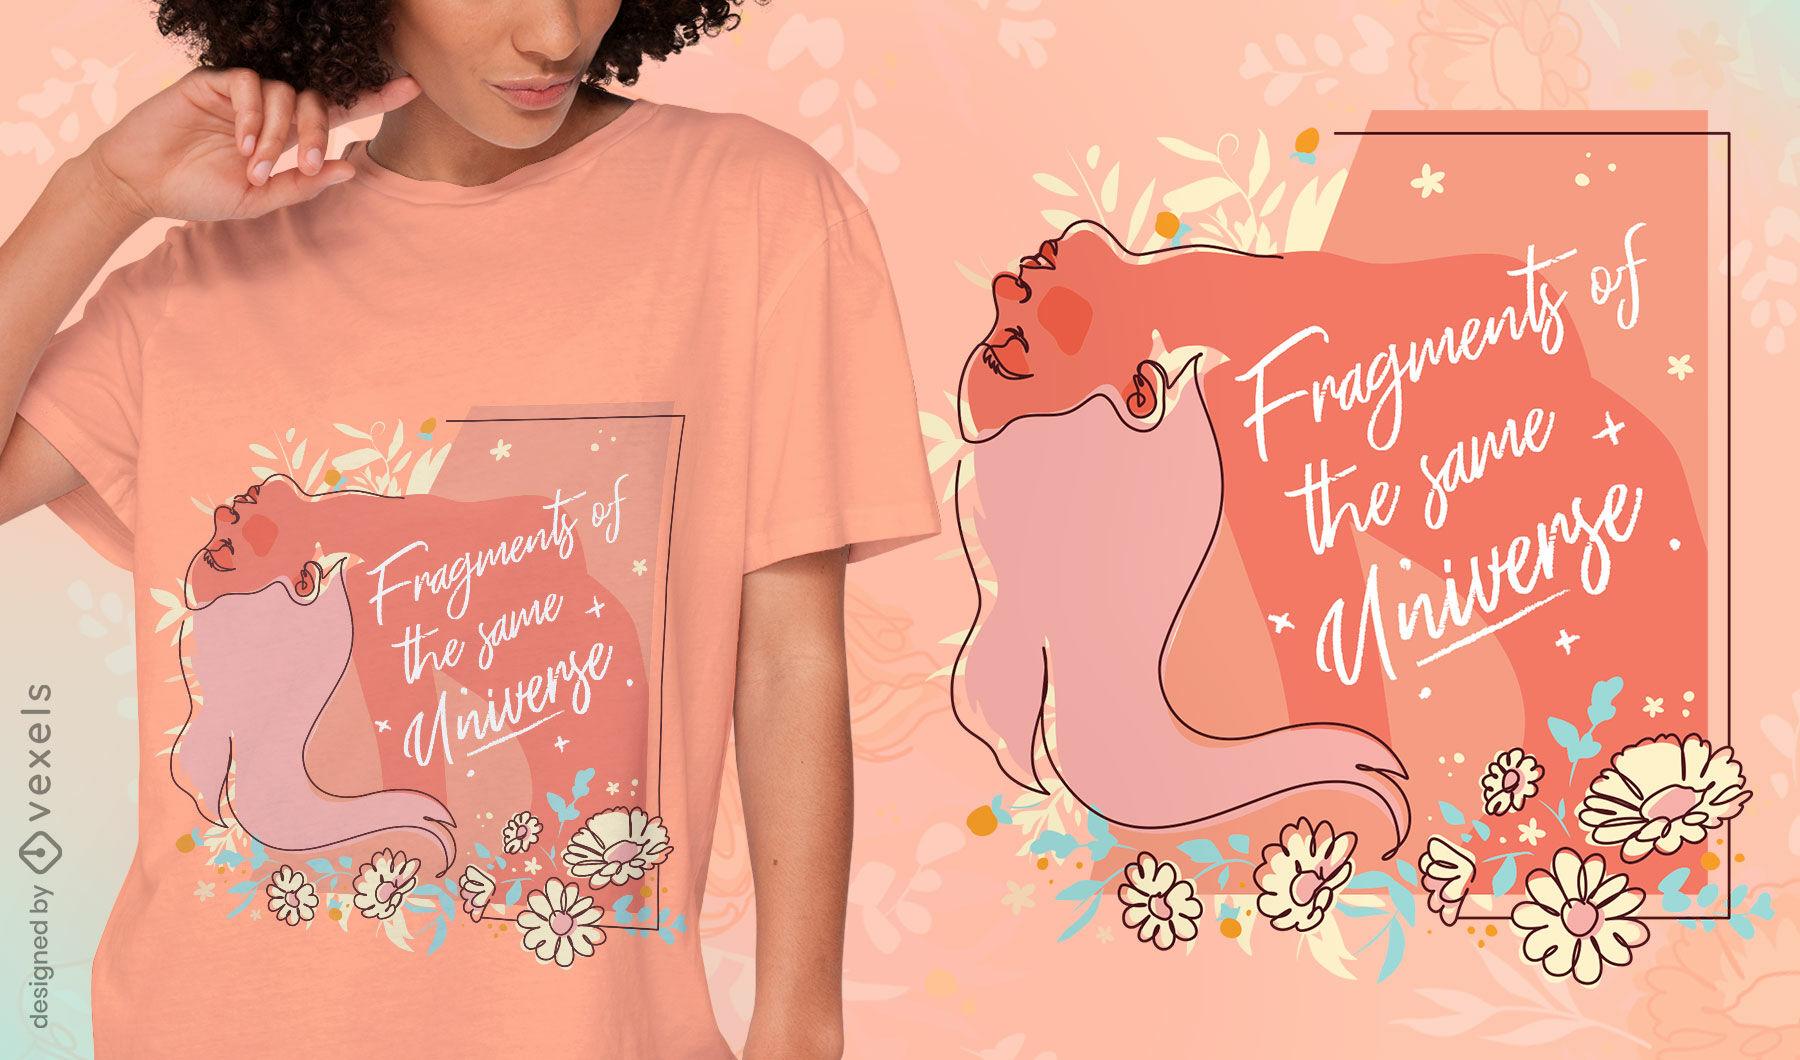 Girl universe mental health t-shirt design